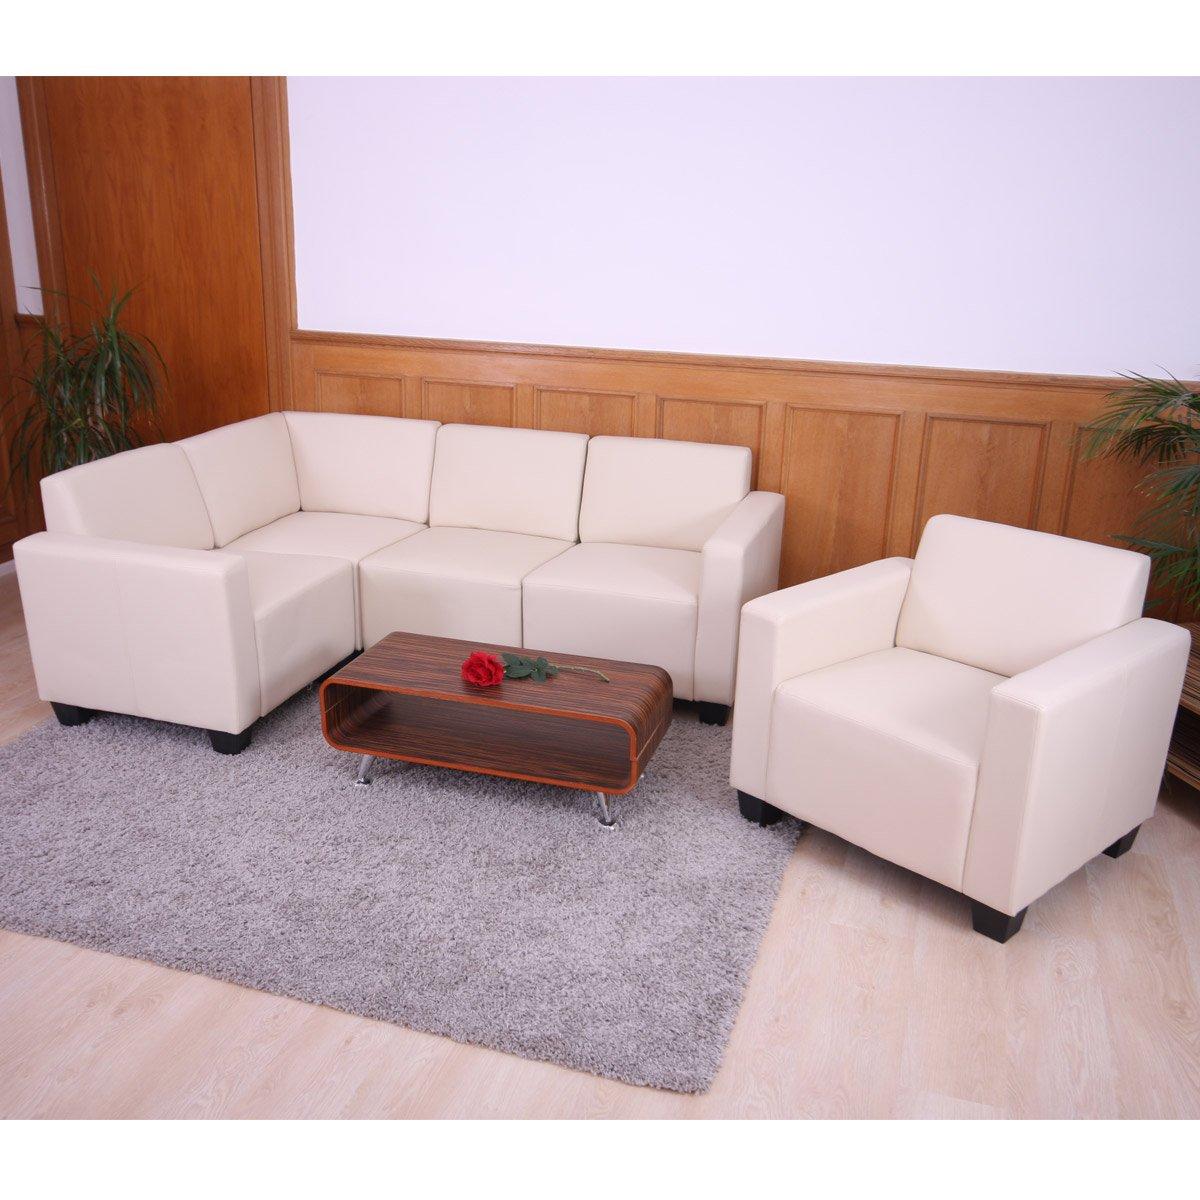 Sofa modular lyon en 4 piezas 1 sofa individual gran for Sofa individual precio